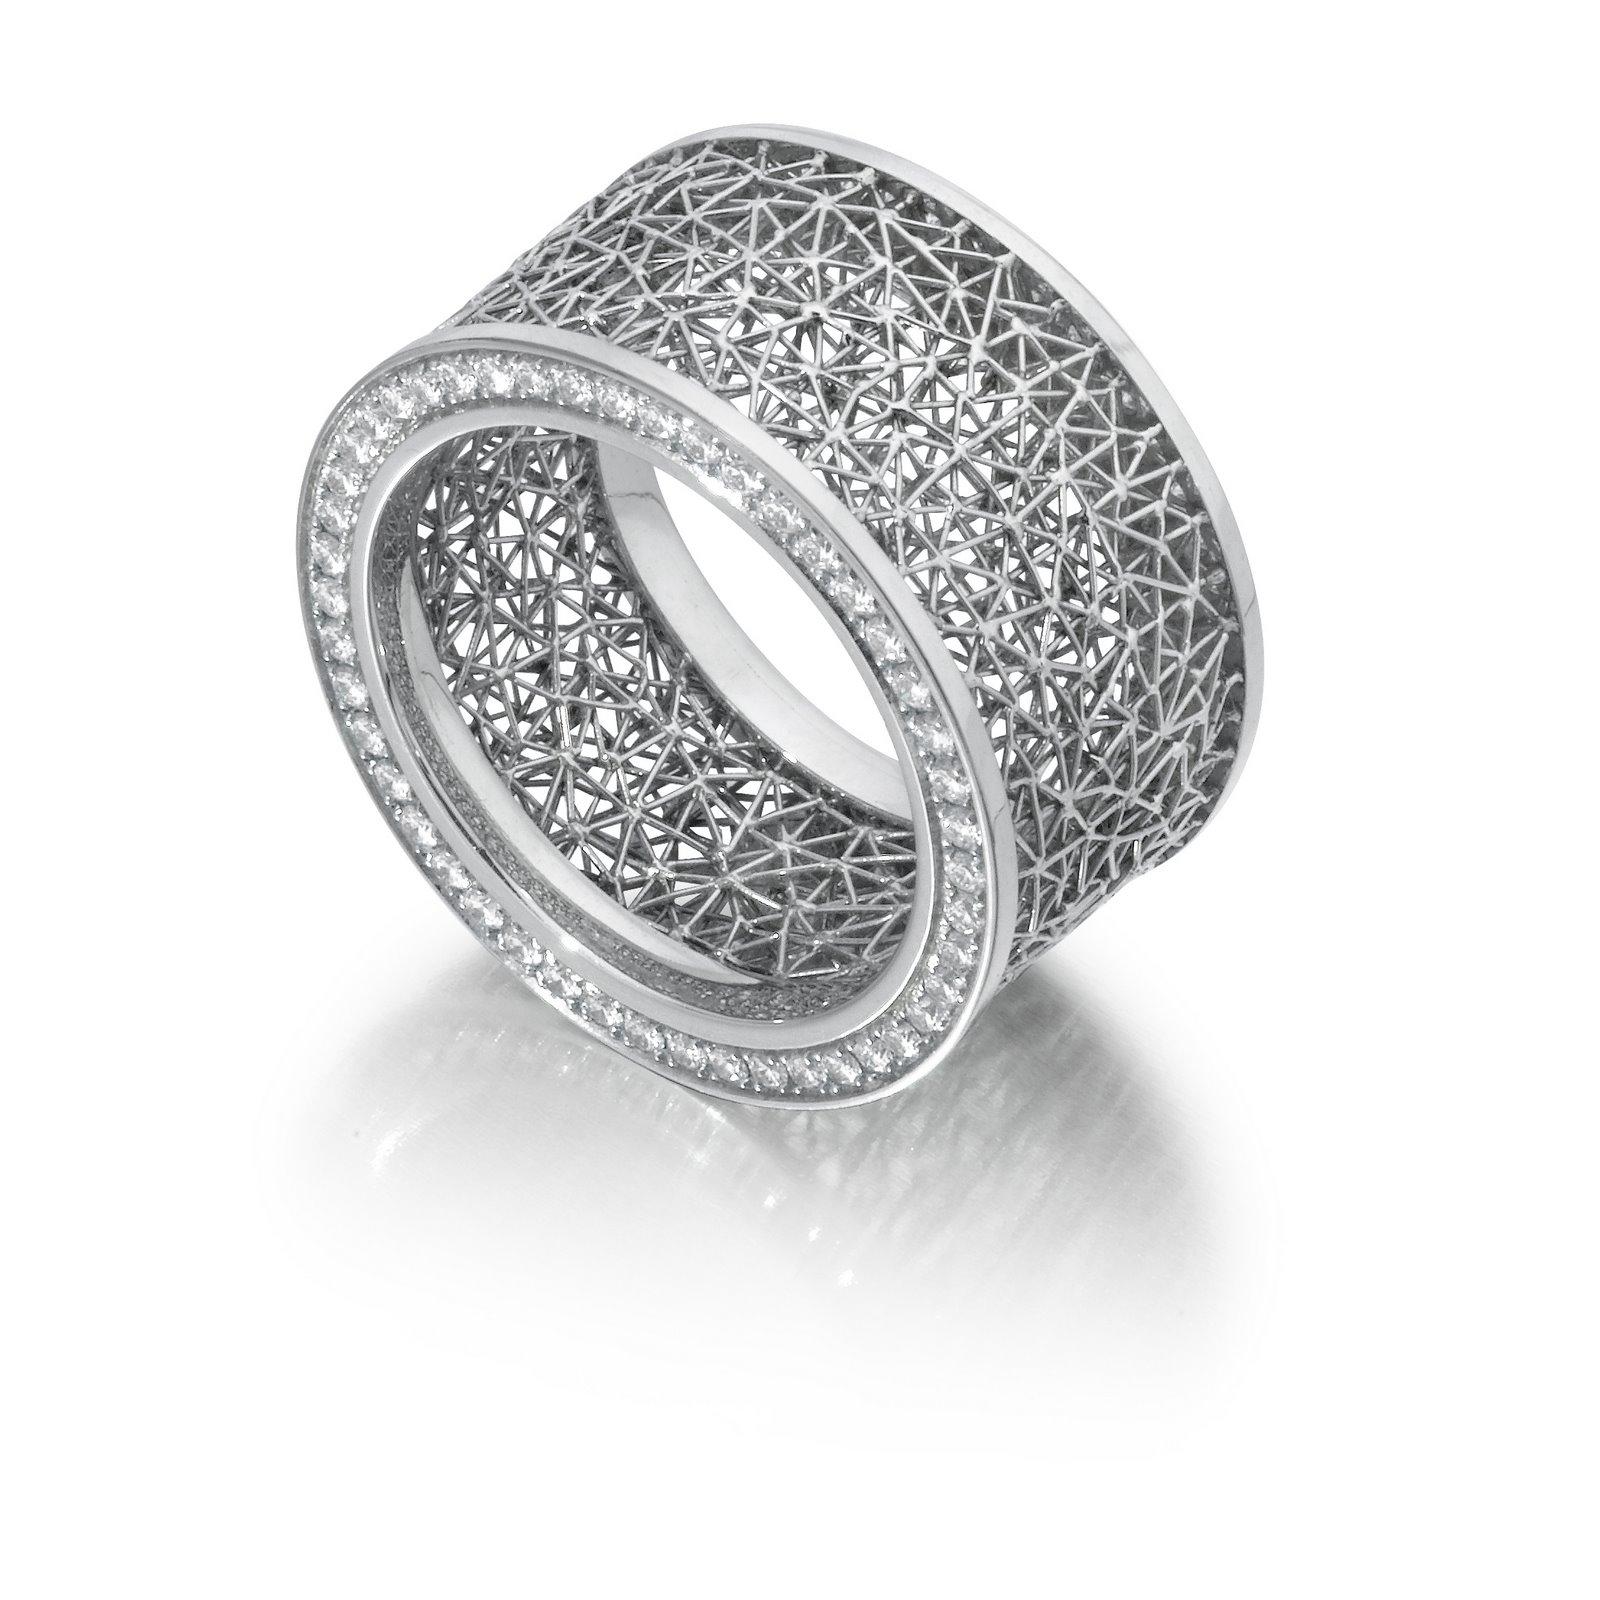 Price fall boosts platinum jewellery demand  Platinum Jewellery Inspiration